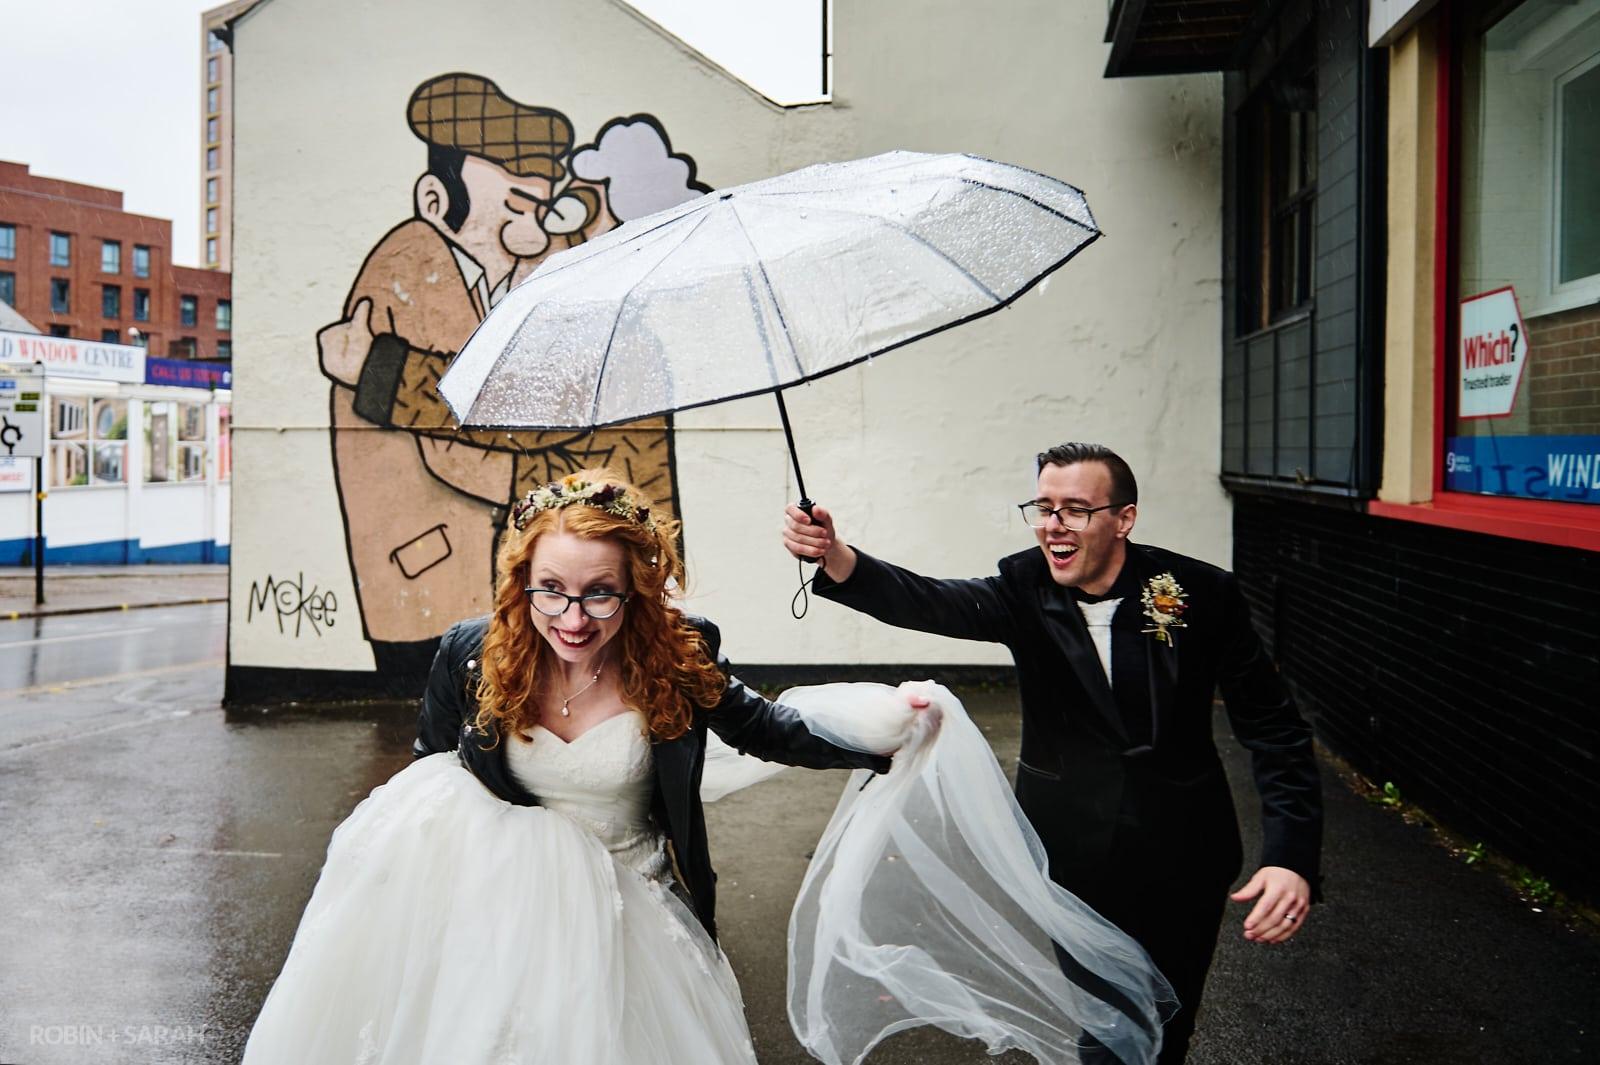 Alternative bride and groom running from rain with umbrella